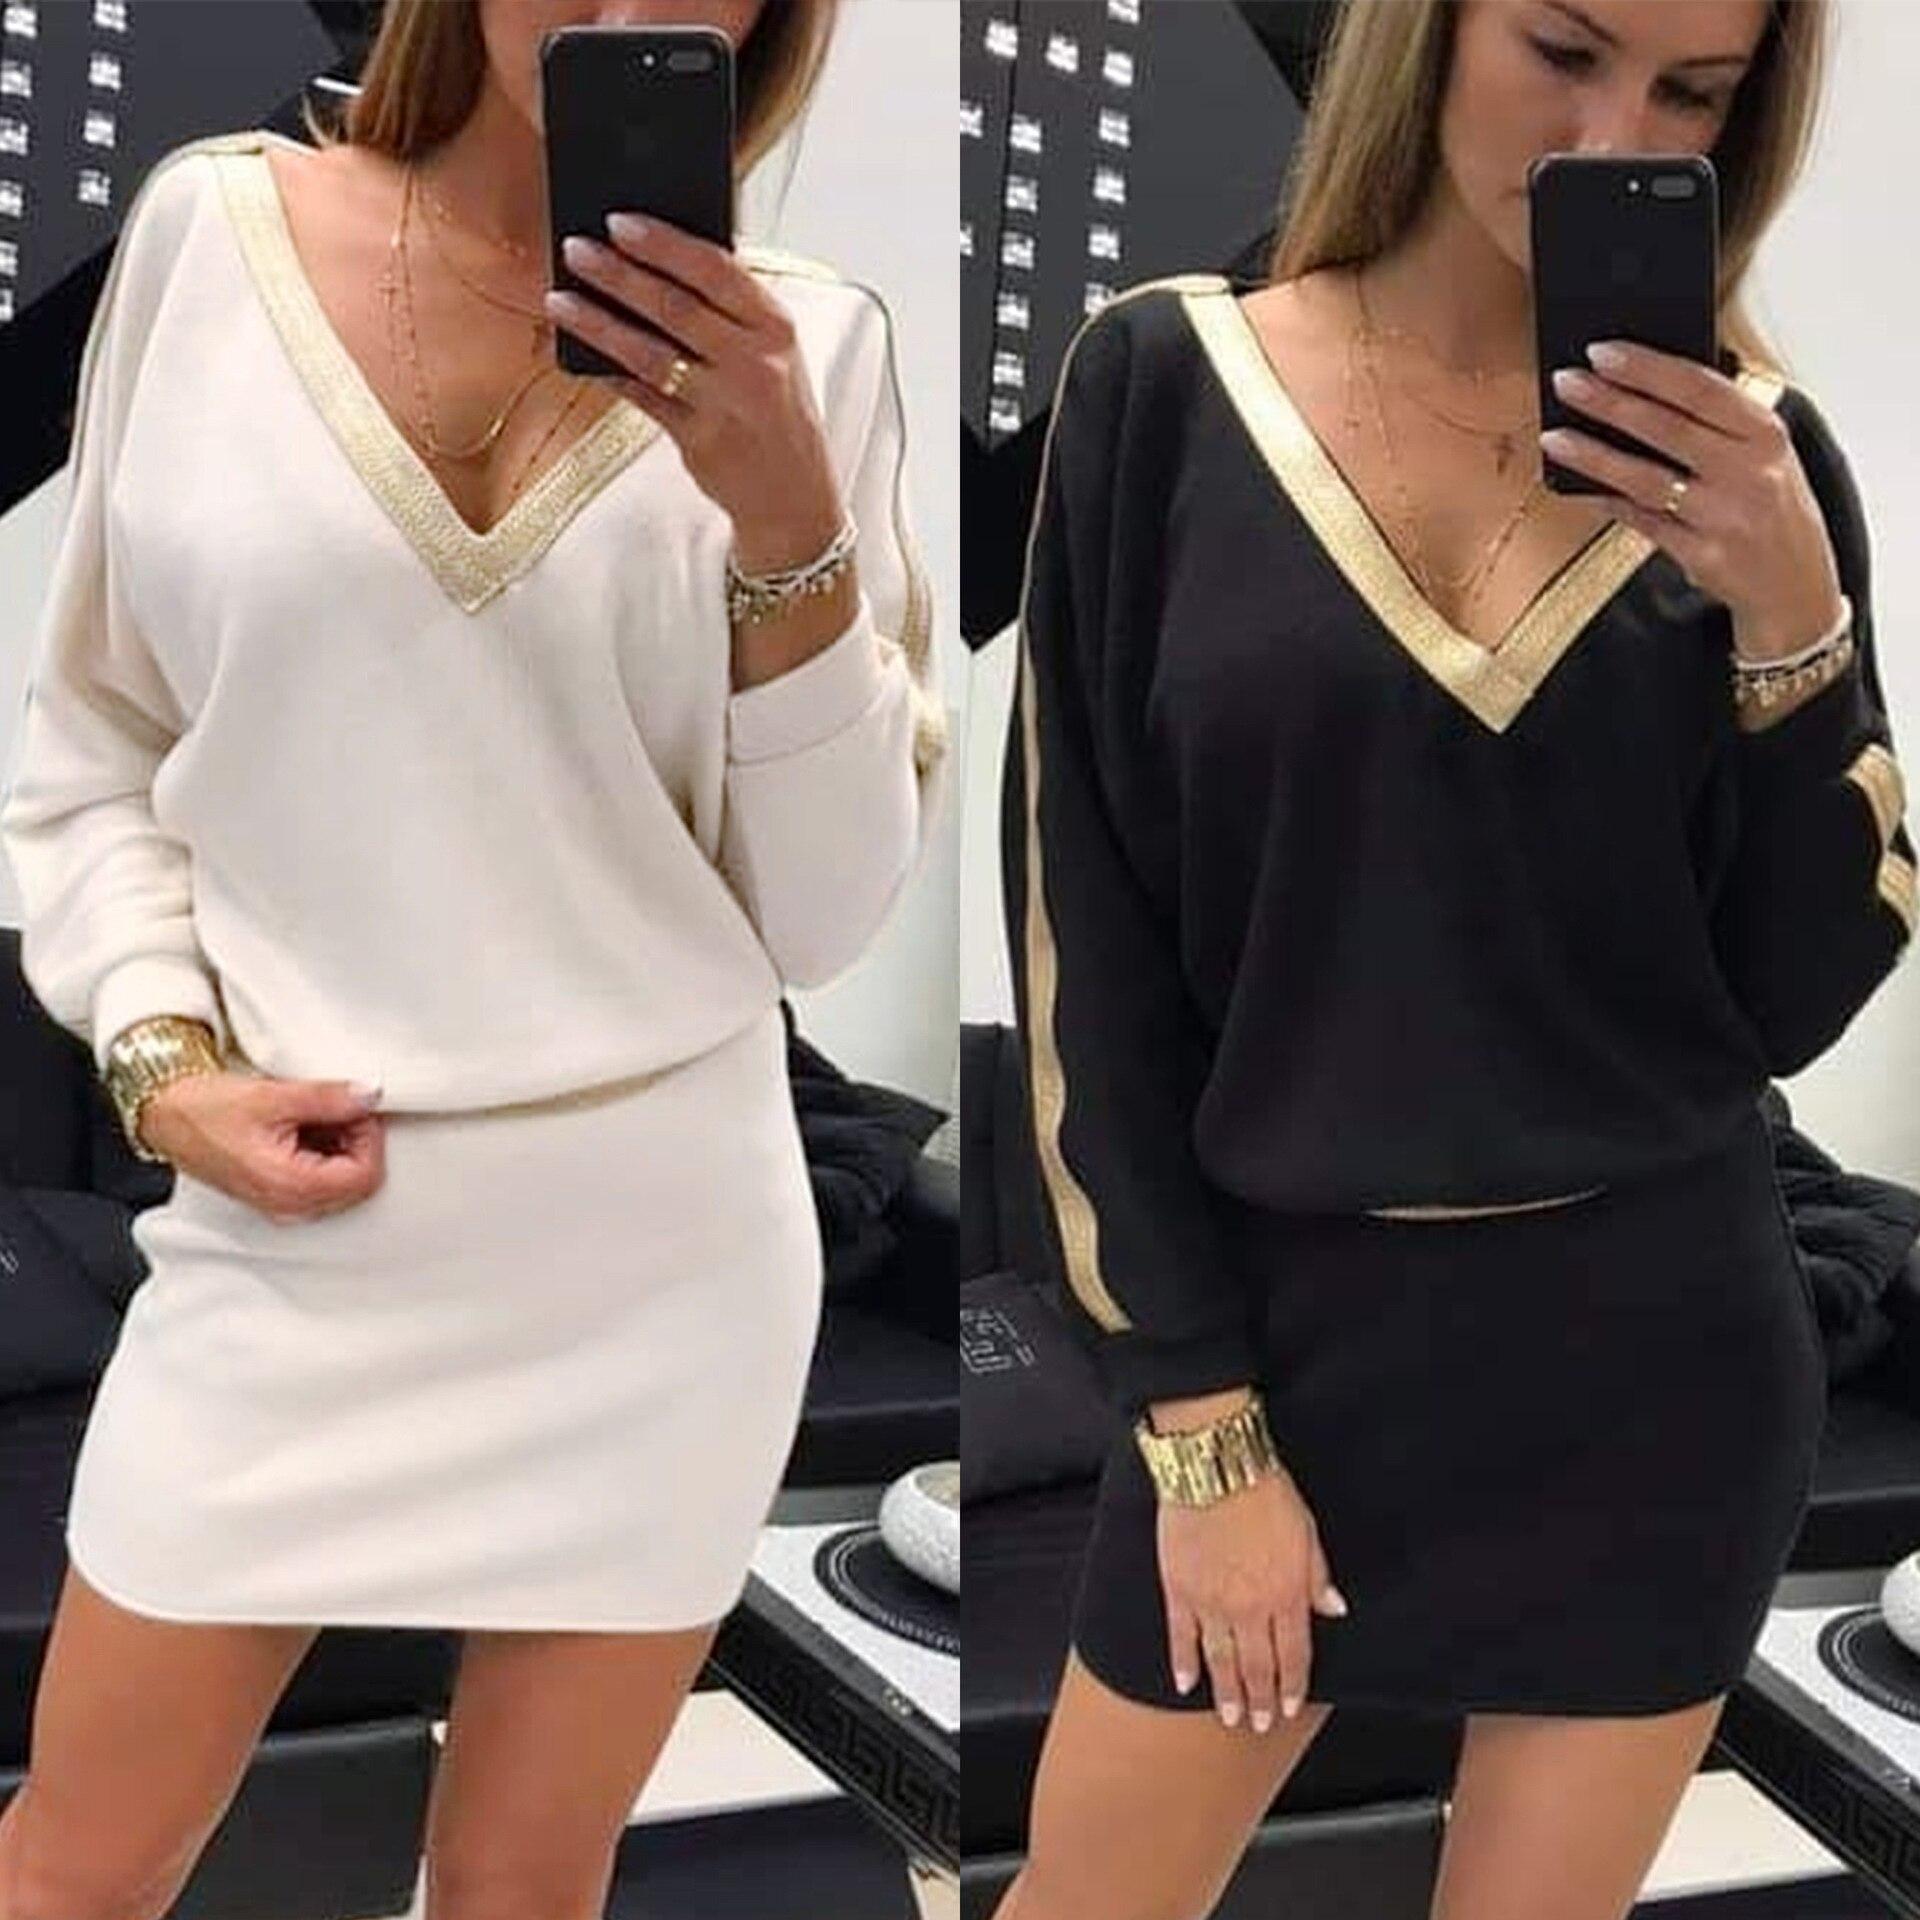 2019 Sexy Low Cut Patchwork Long Sleeve Elastic Waist Women Mini Dress Sexy Dress Women Party Night Clbu Wear|Dresses| - AliExpress